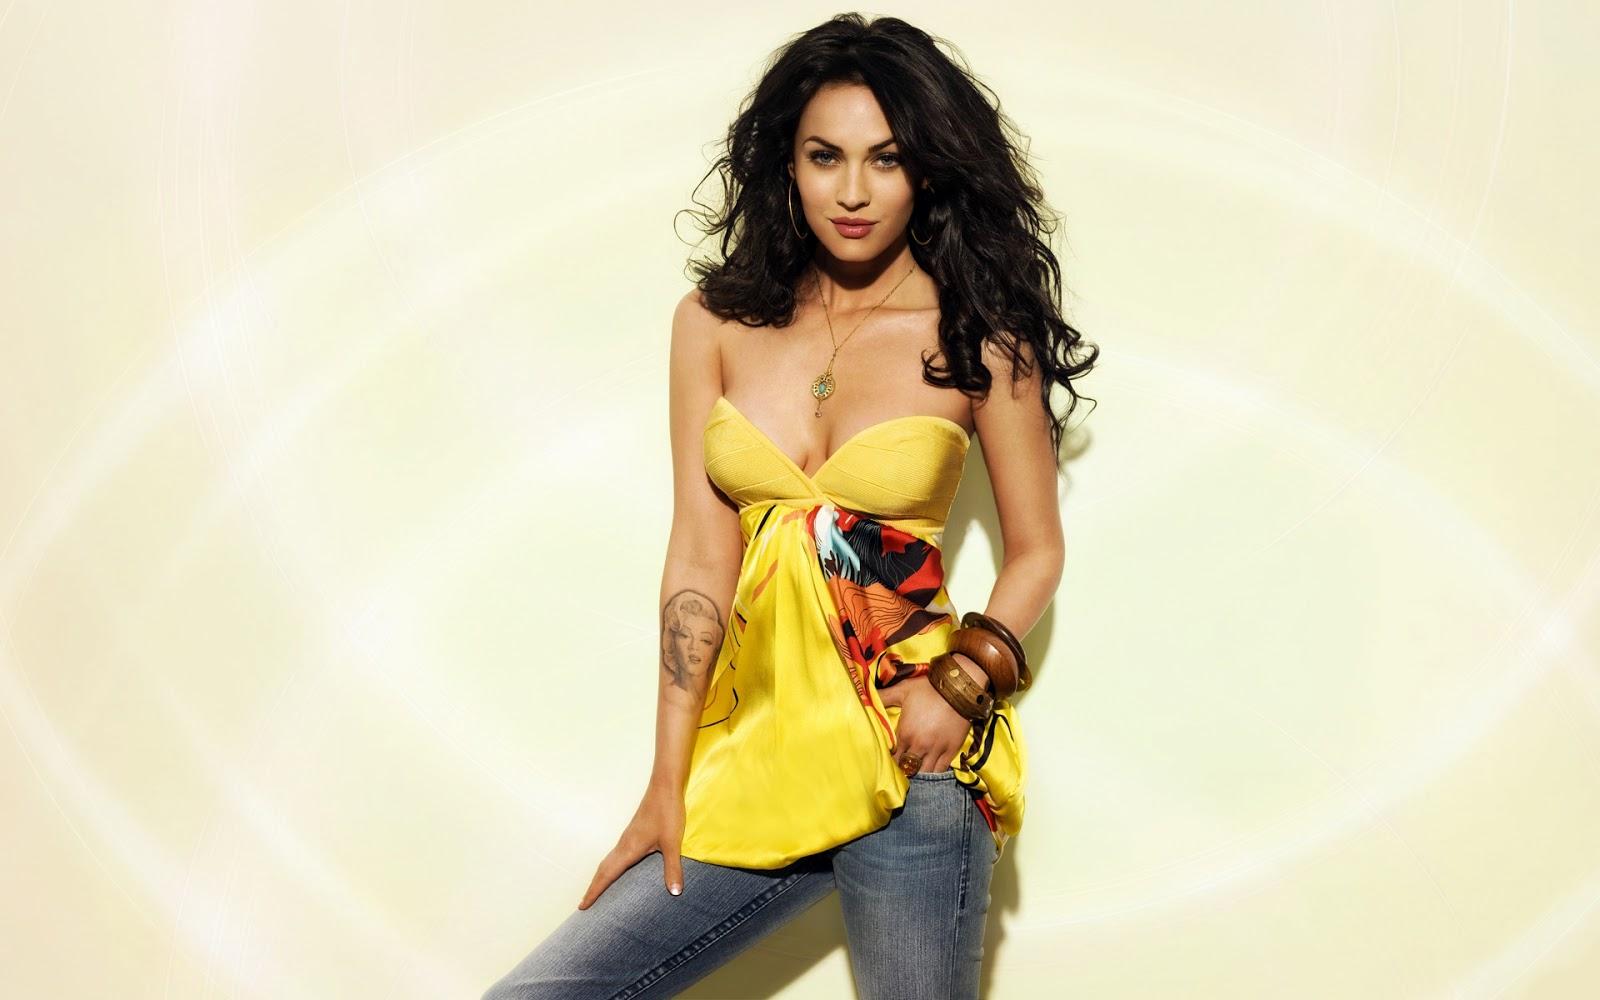 Megan Fox Looking Hot in Yellow Dress 22